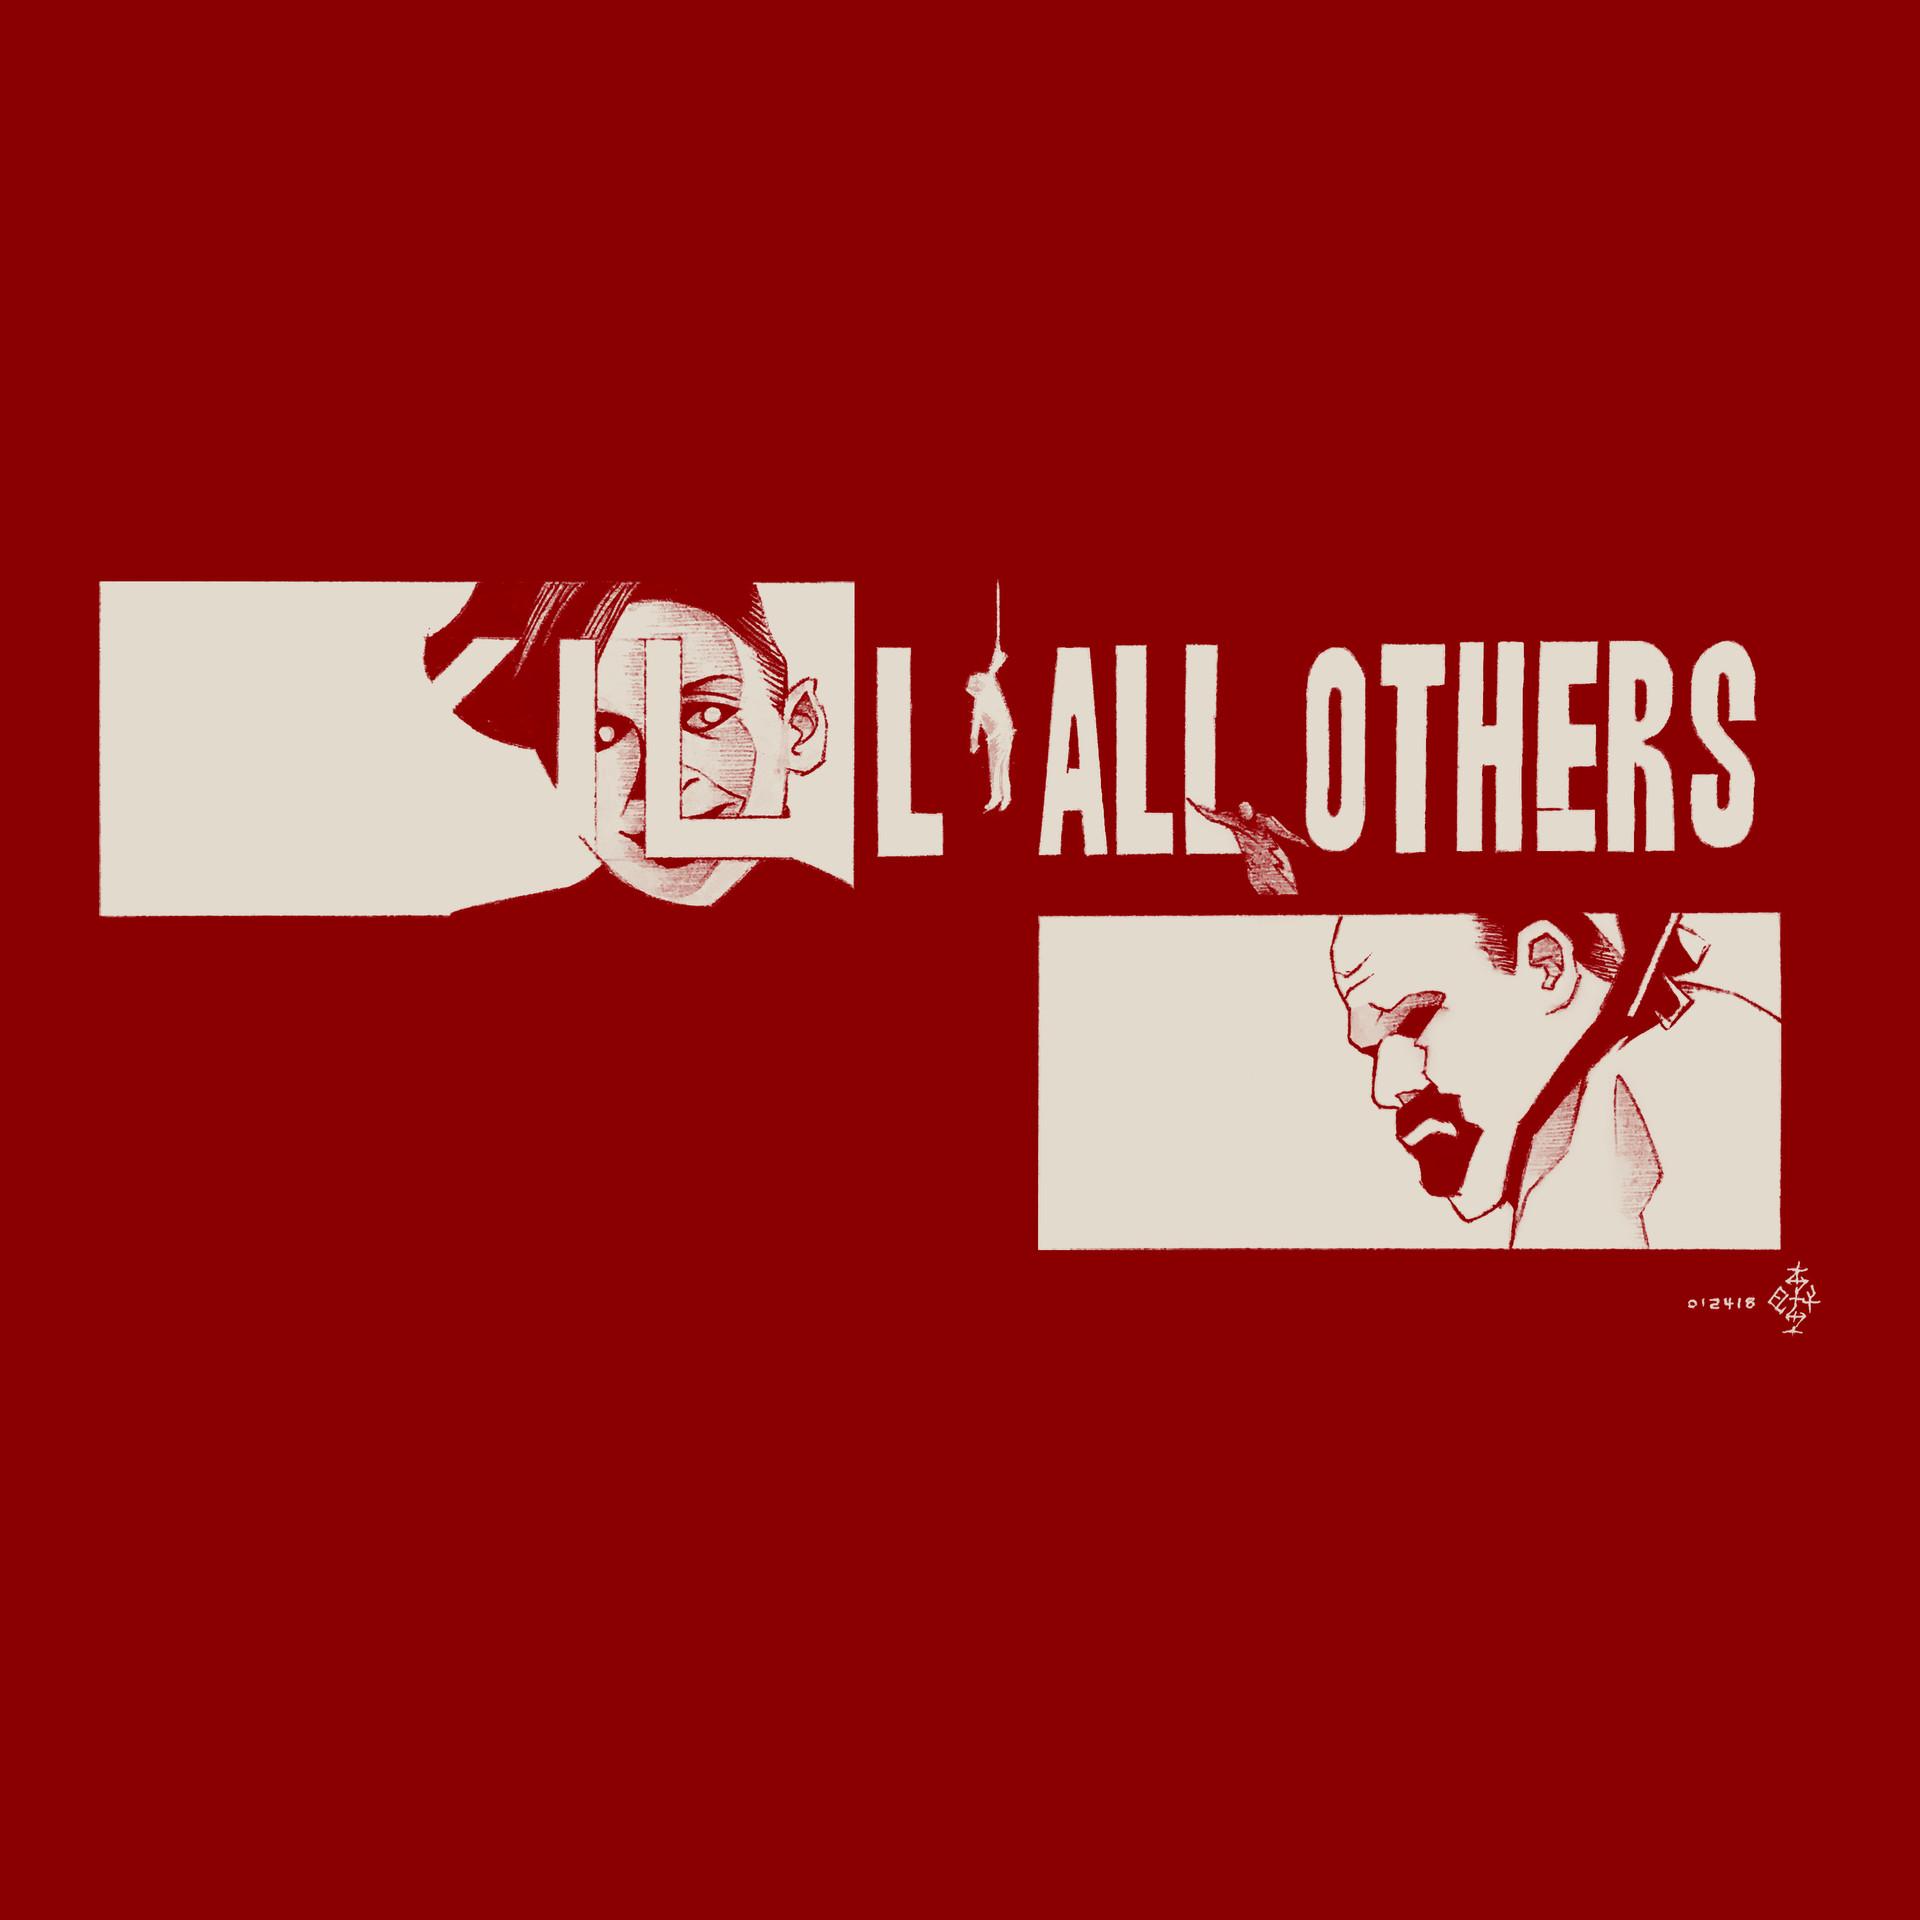 E lynx killallothers red